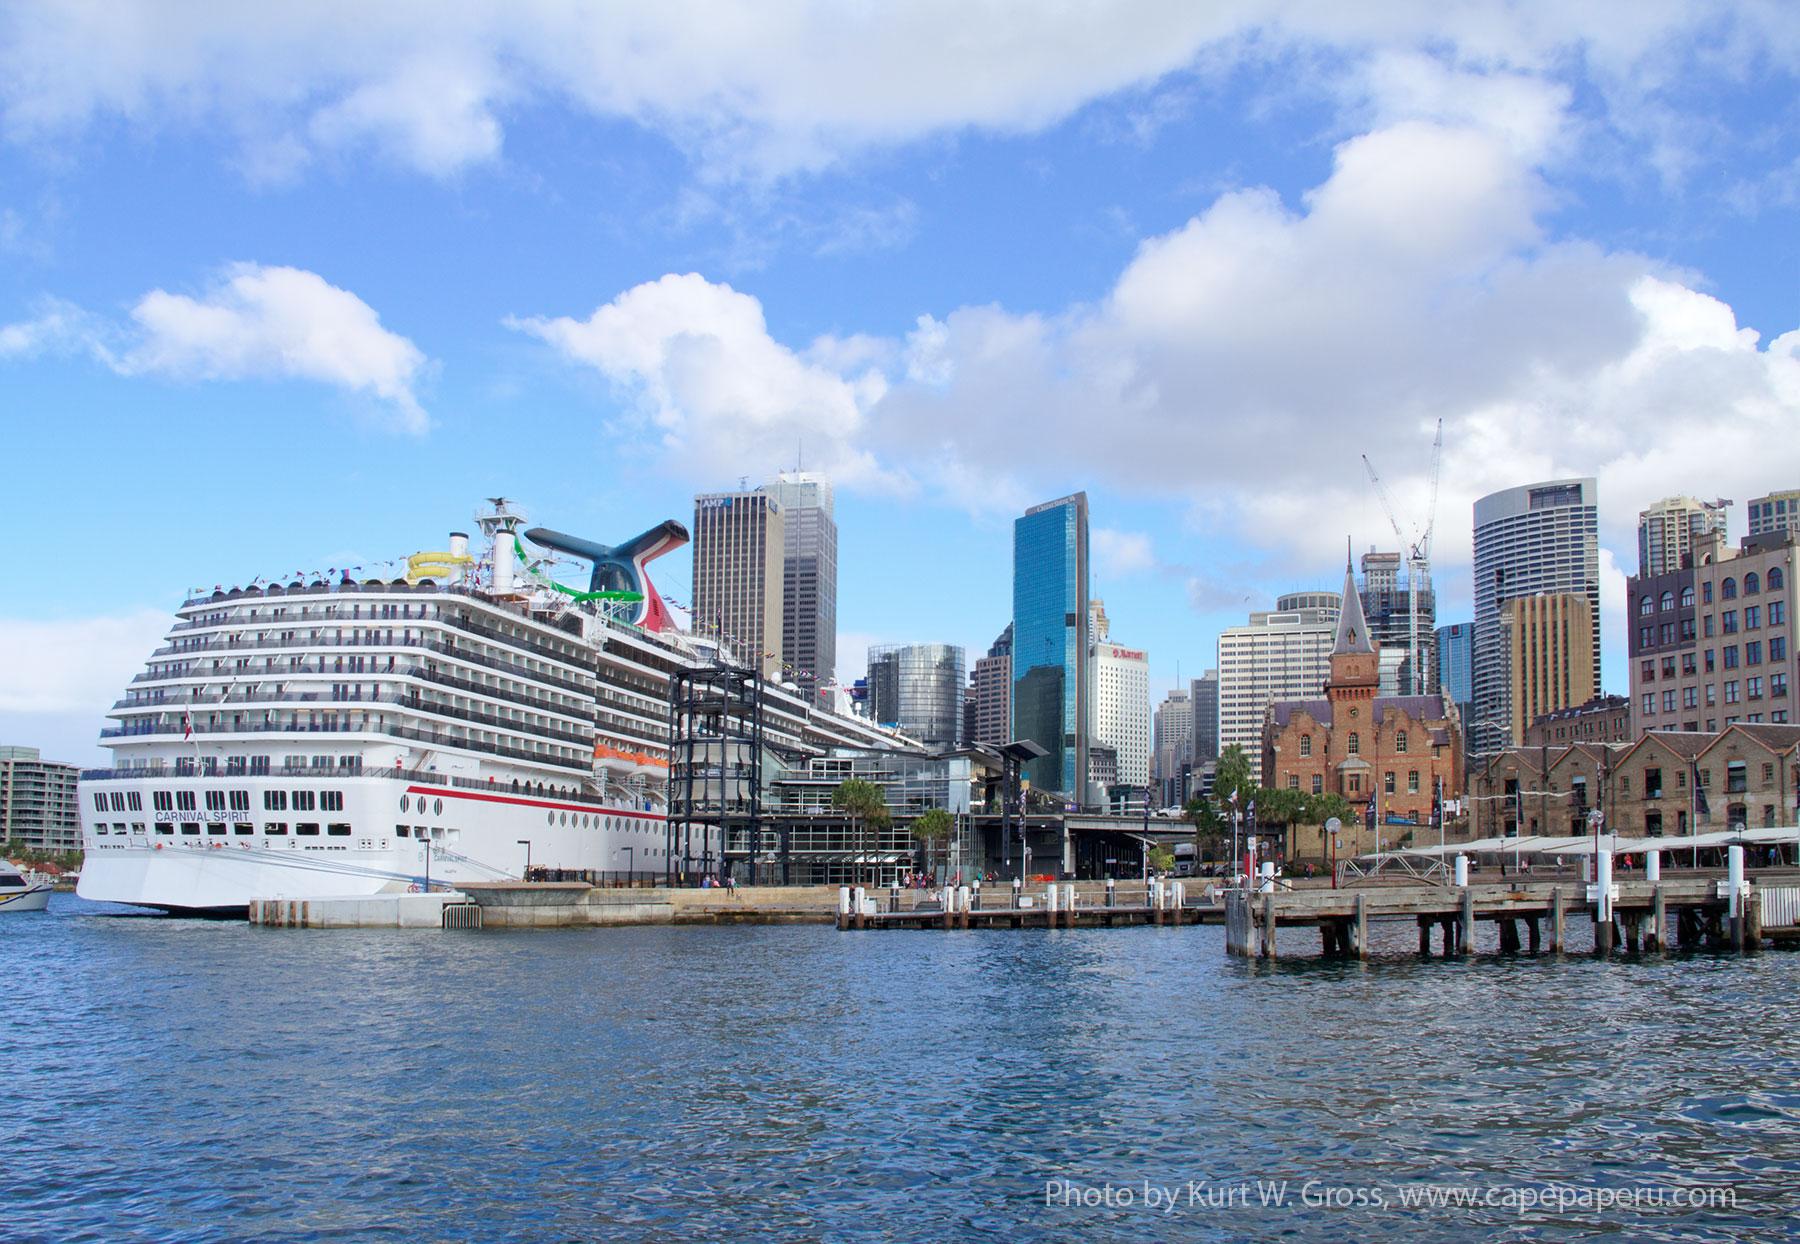 Park Hyatt Hotel, Sydney, Australia